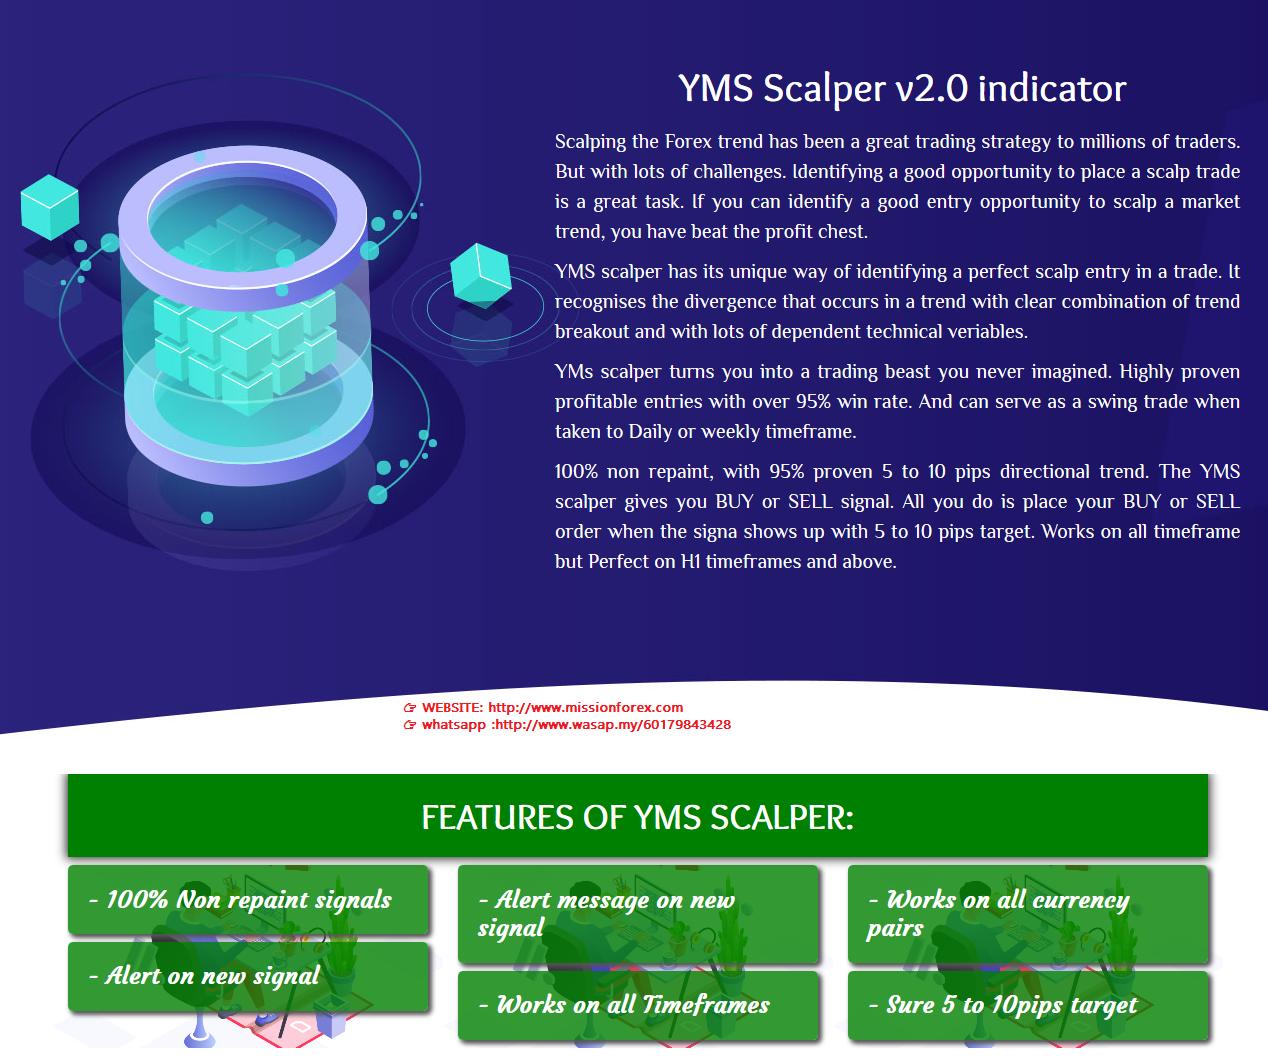 YMS Scalper v2.0 indicator - forex trading indicator